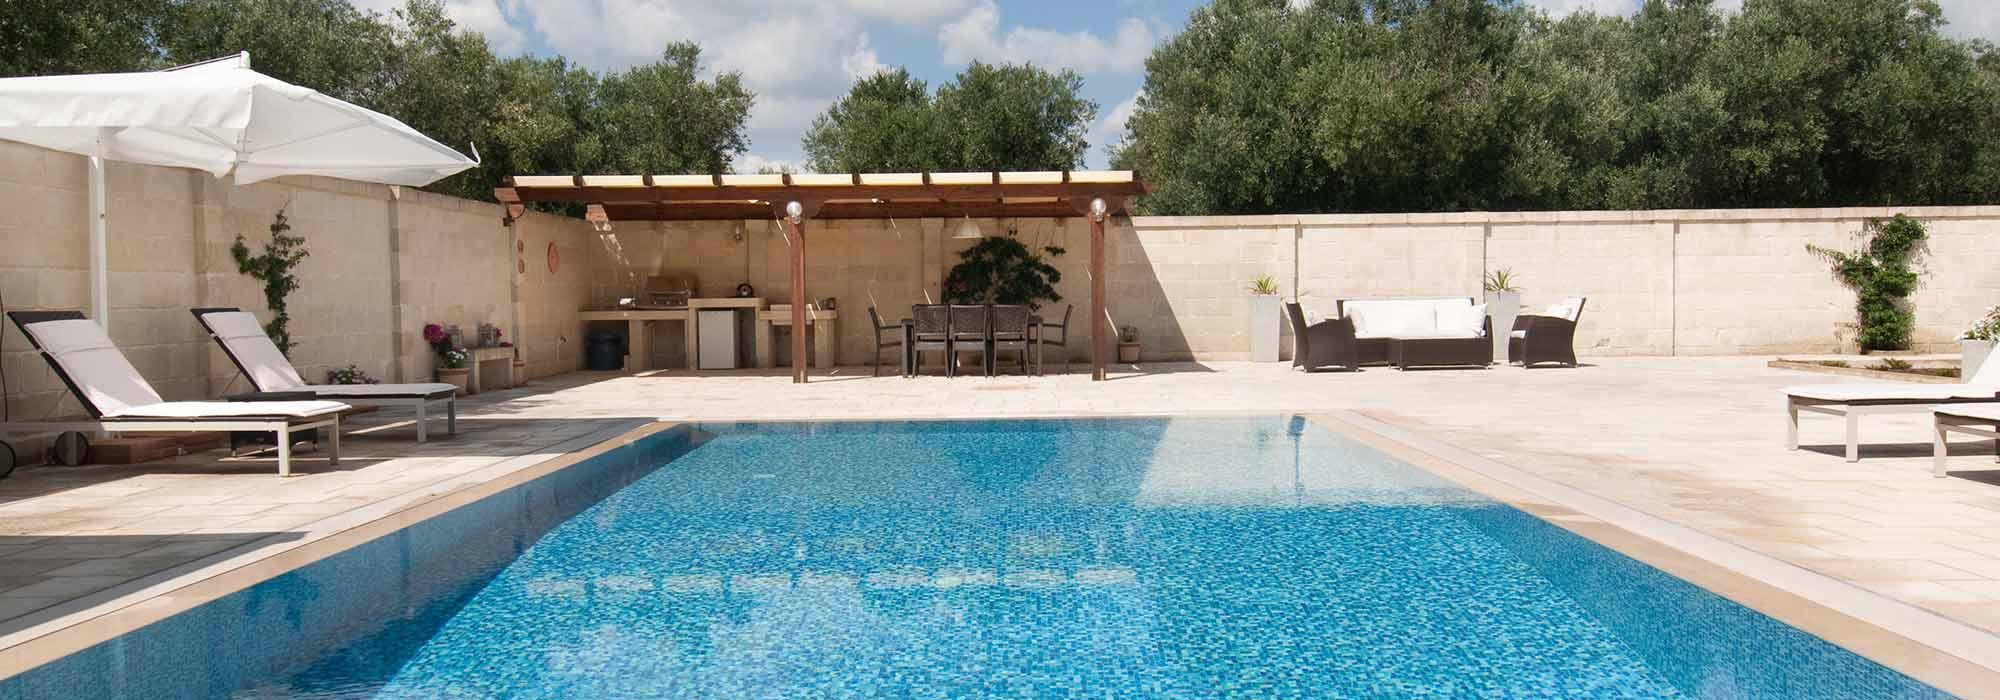 Masseria Bella – Luxury Villa in Puglia – Sleeps 8